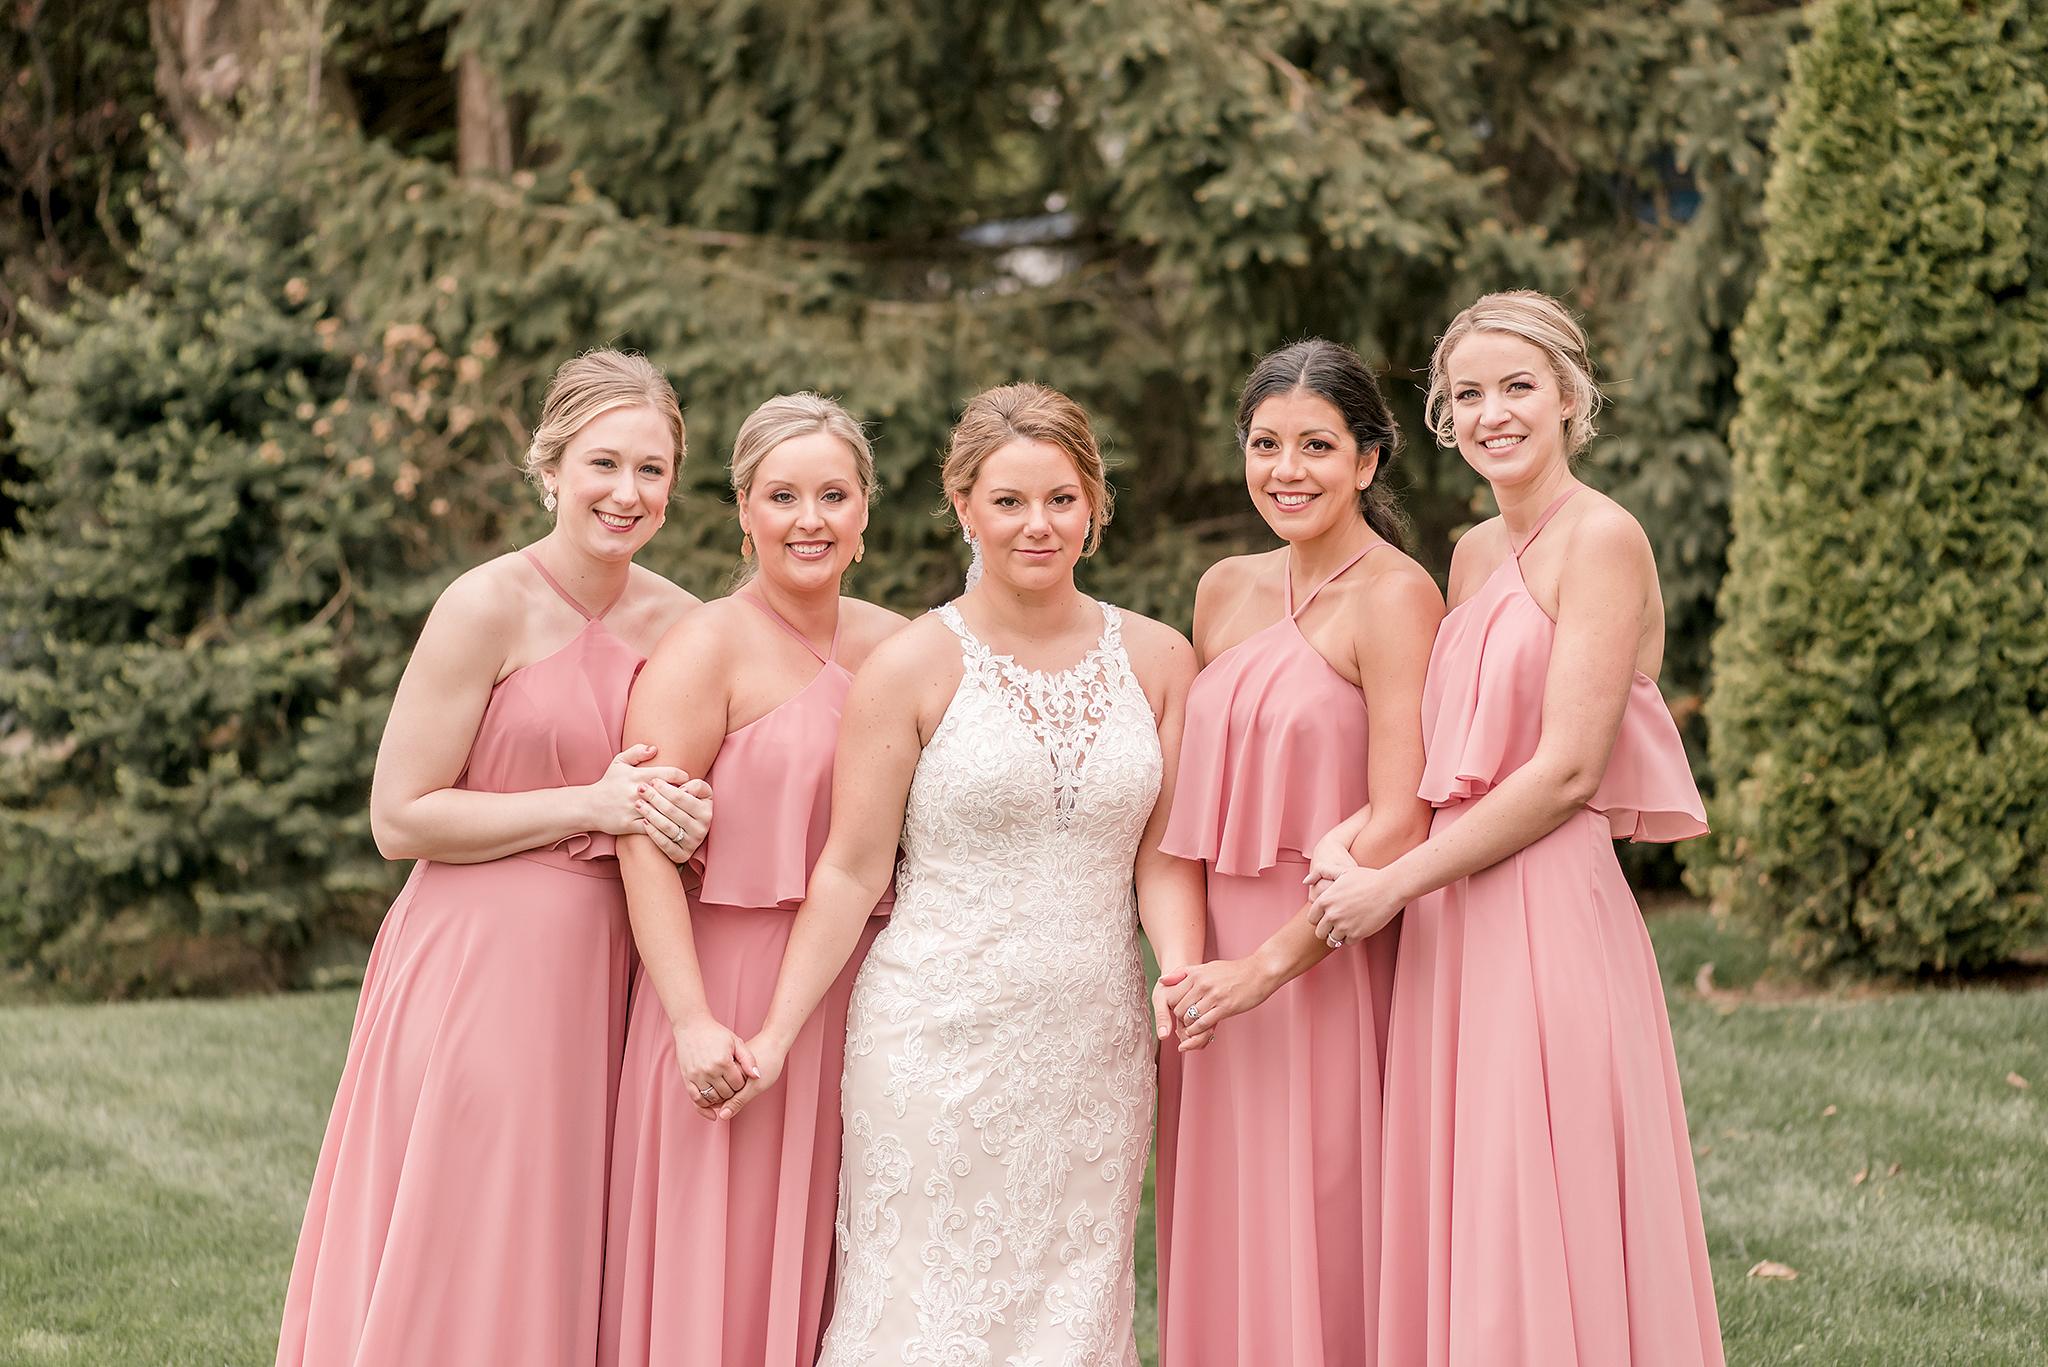 LINDSAY-ADKINS-PHOTOGRAPHY-MICHIGAN-WEDDING-PHOTOGRAPHER-FRANKENMUTH-BREWERY-WEDDING-MICHIGAN-BLOG-15